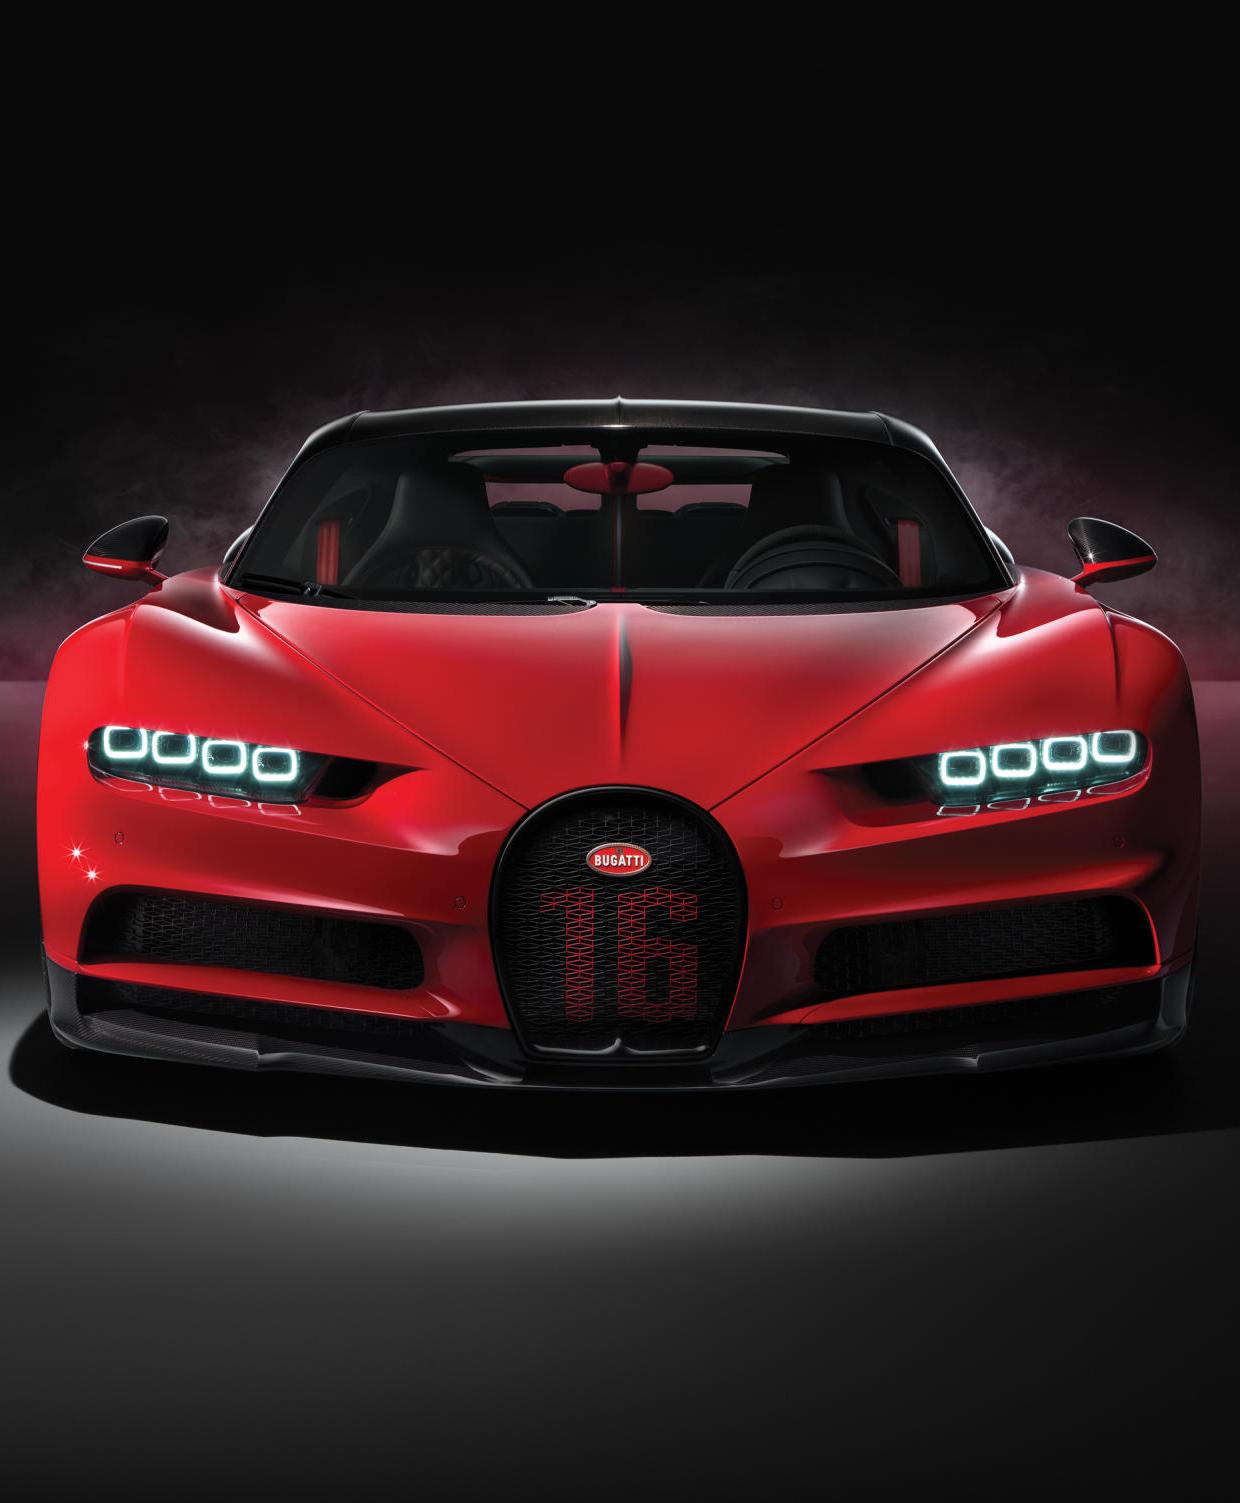 Bugatti Chiron Sport Top Speed: Bugatti Chiron Sport #bugattichiron